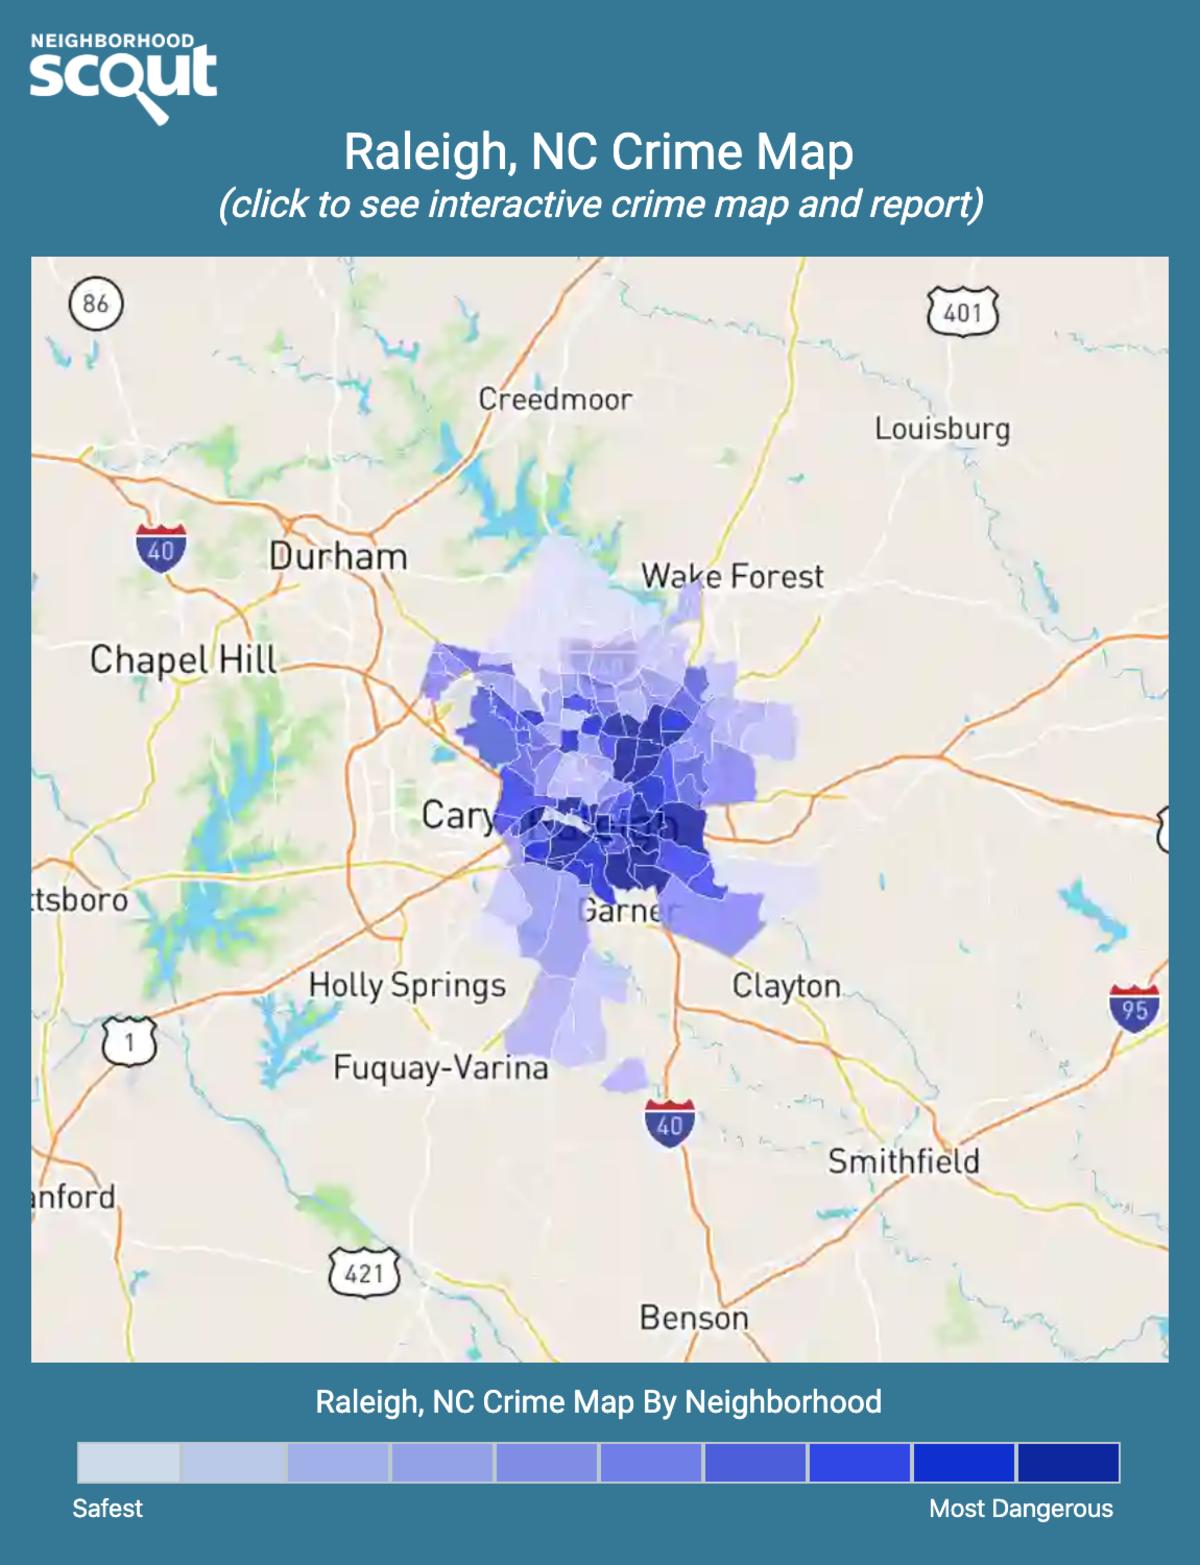 Raleigh, North Carolina crime map